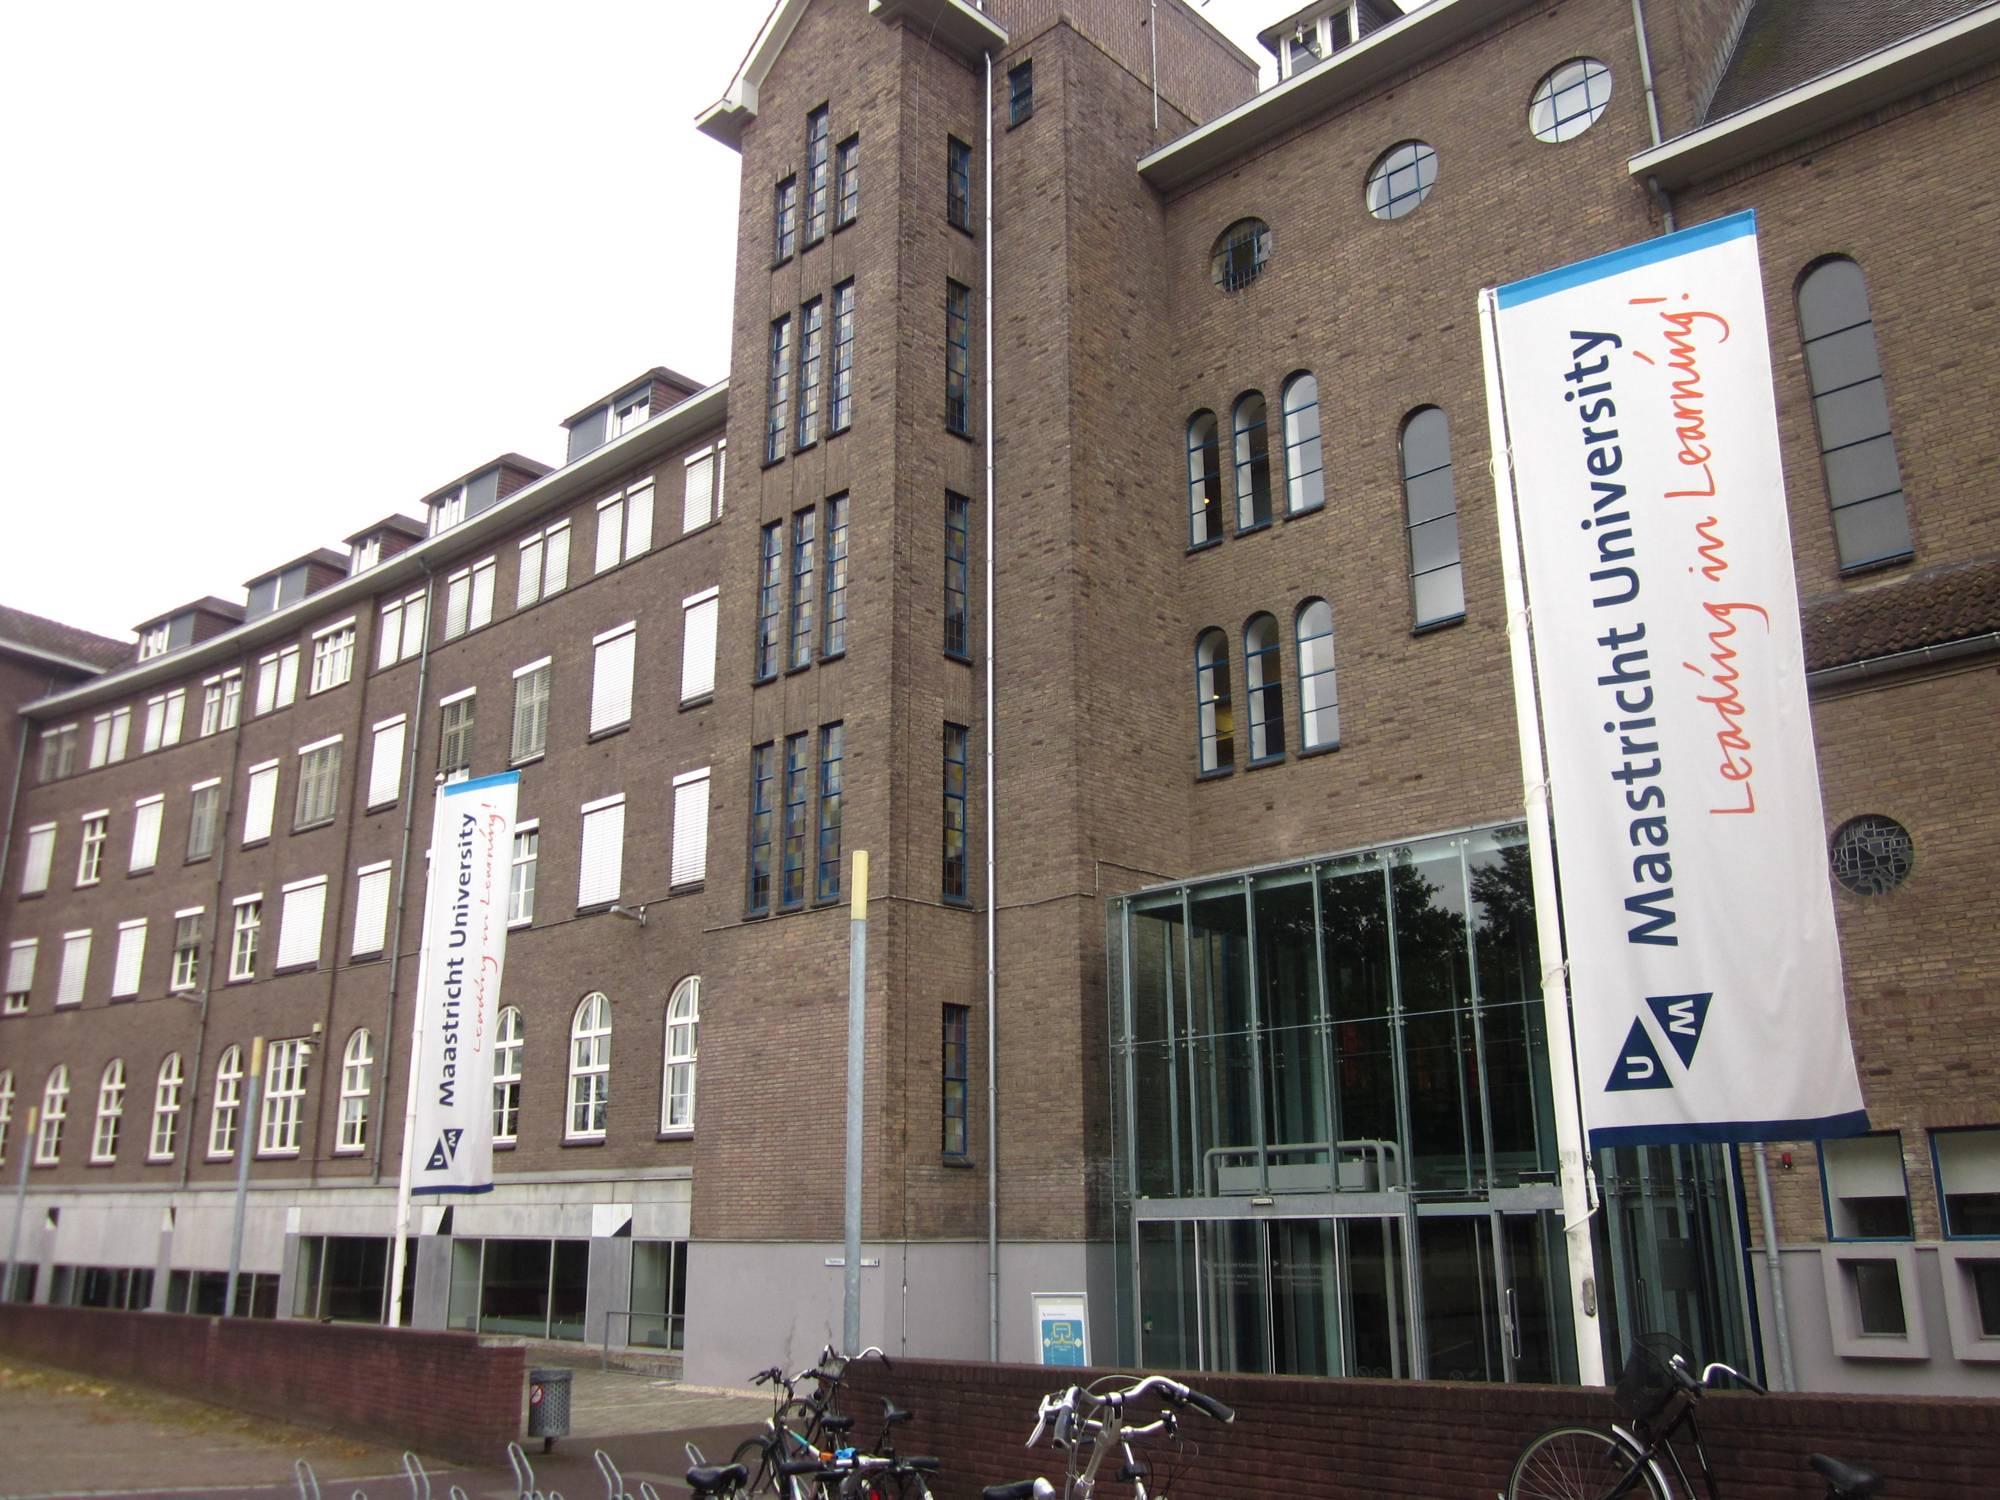 Maastricht University, Netherlands (Photo Credit: https://pine-maastricht.nl/)